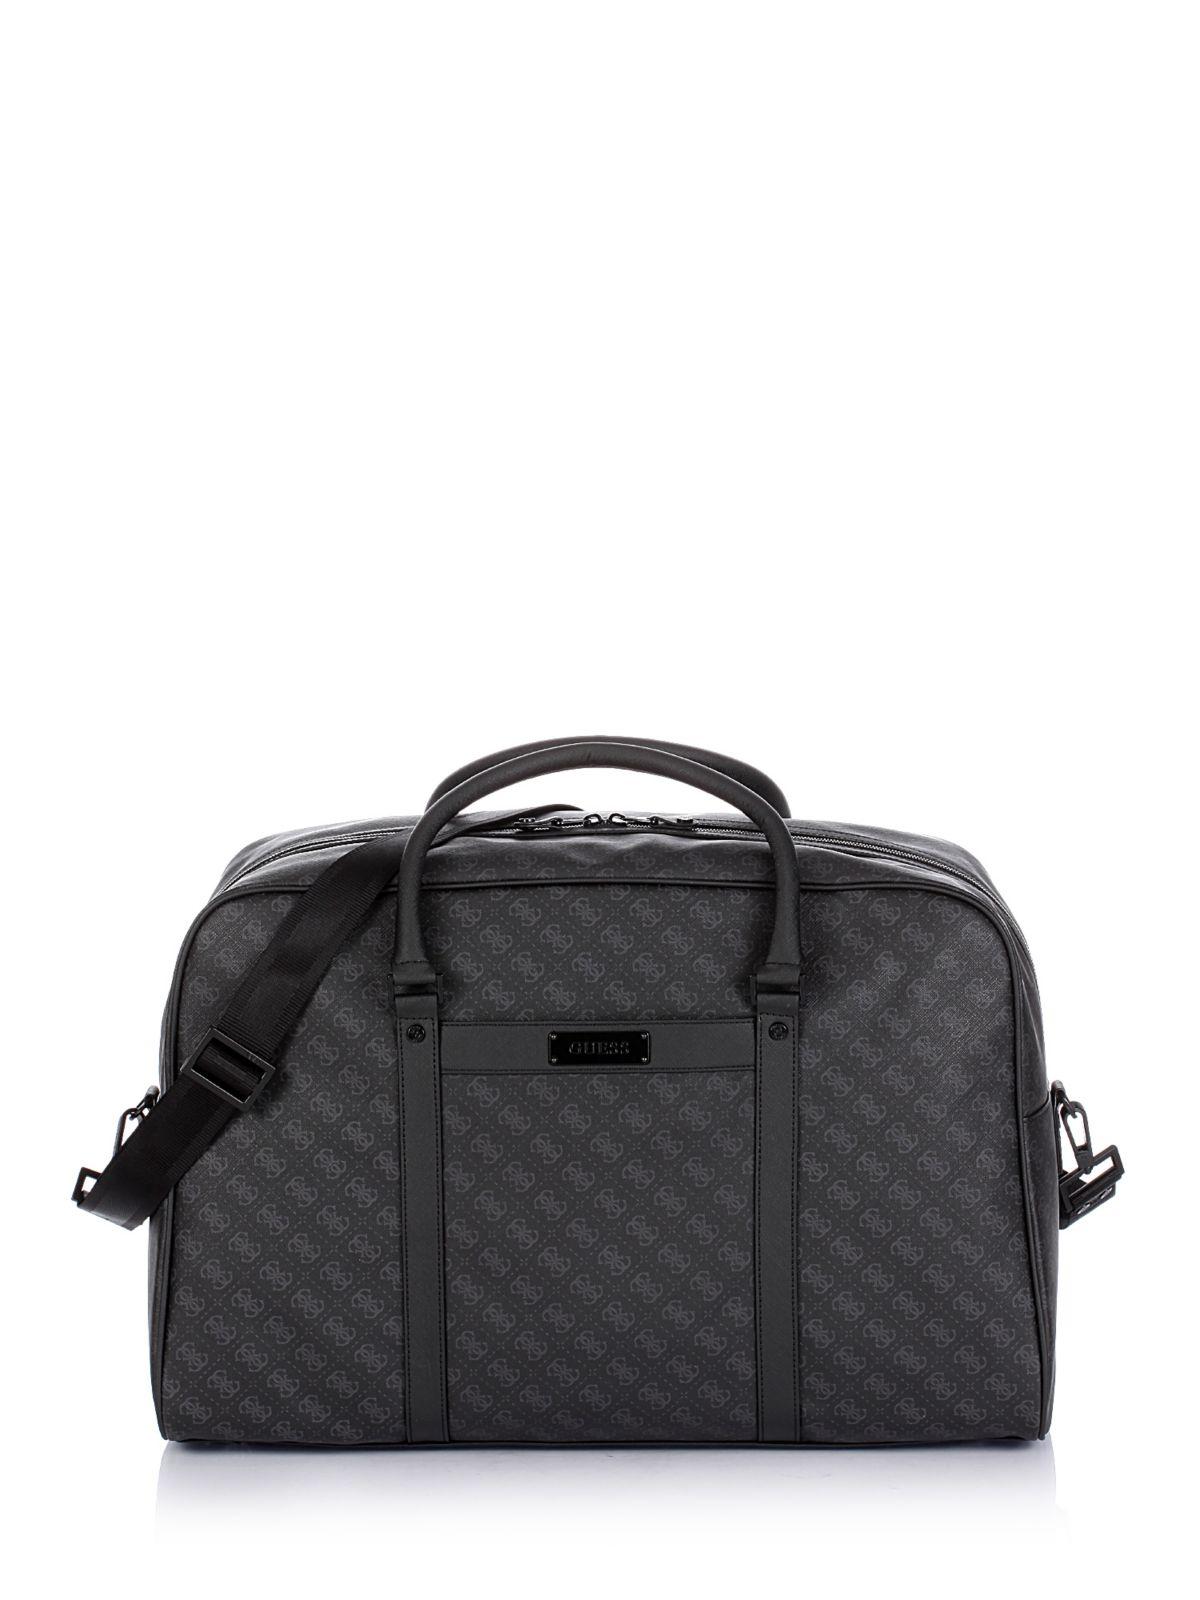 Guess Myself Travel Bag in Black for Men